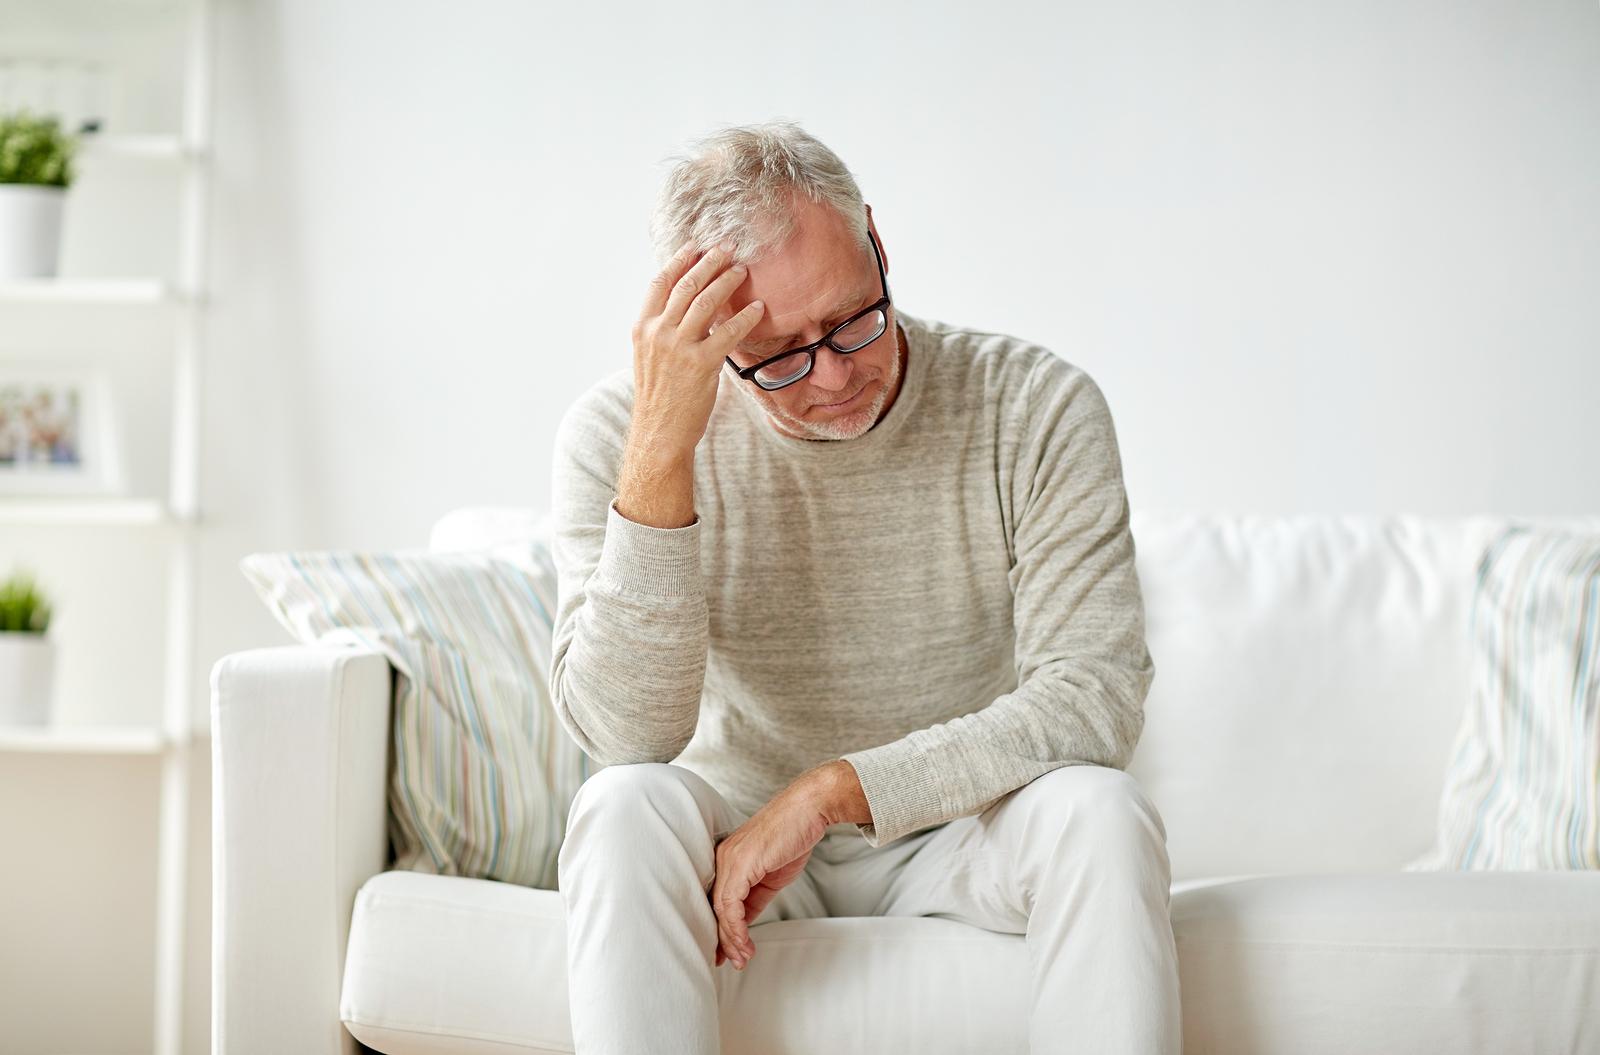 bigstock-health-pain-stress-old-age--151219655.jpg